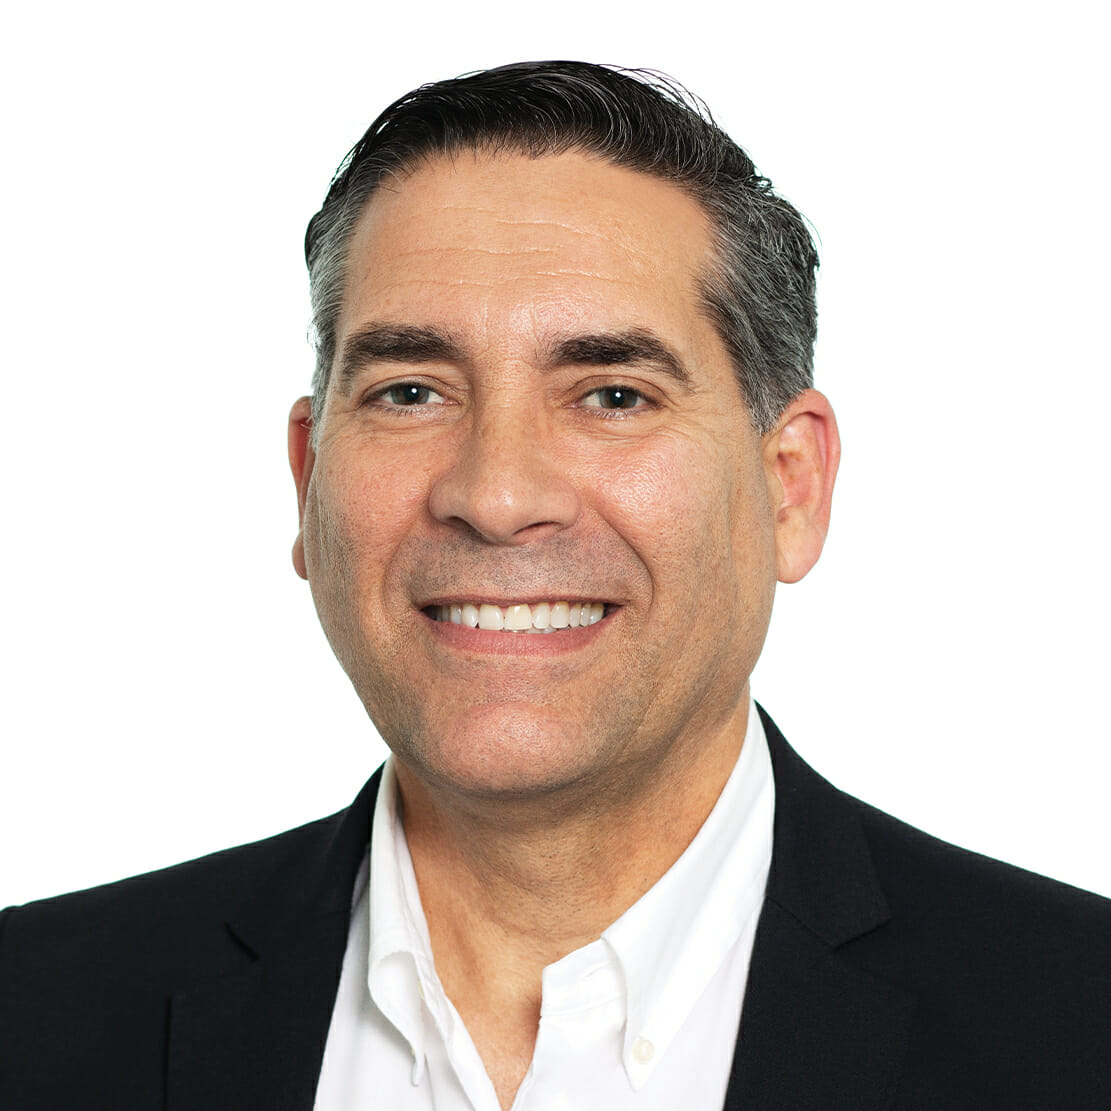 Luis Riobueno